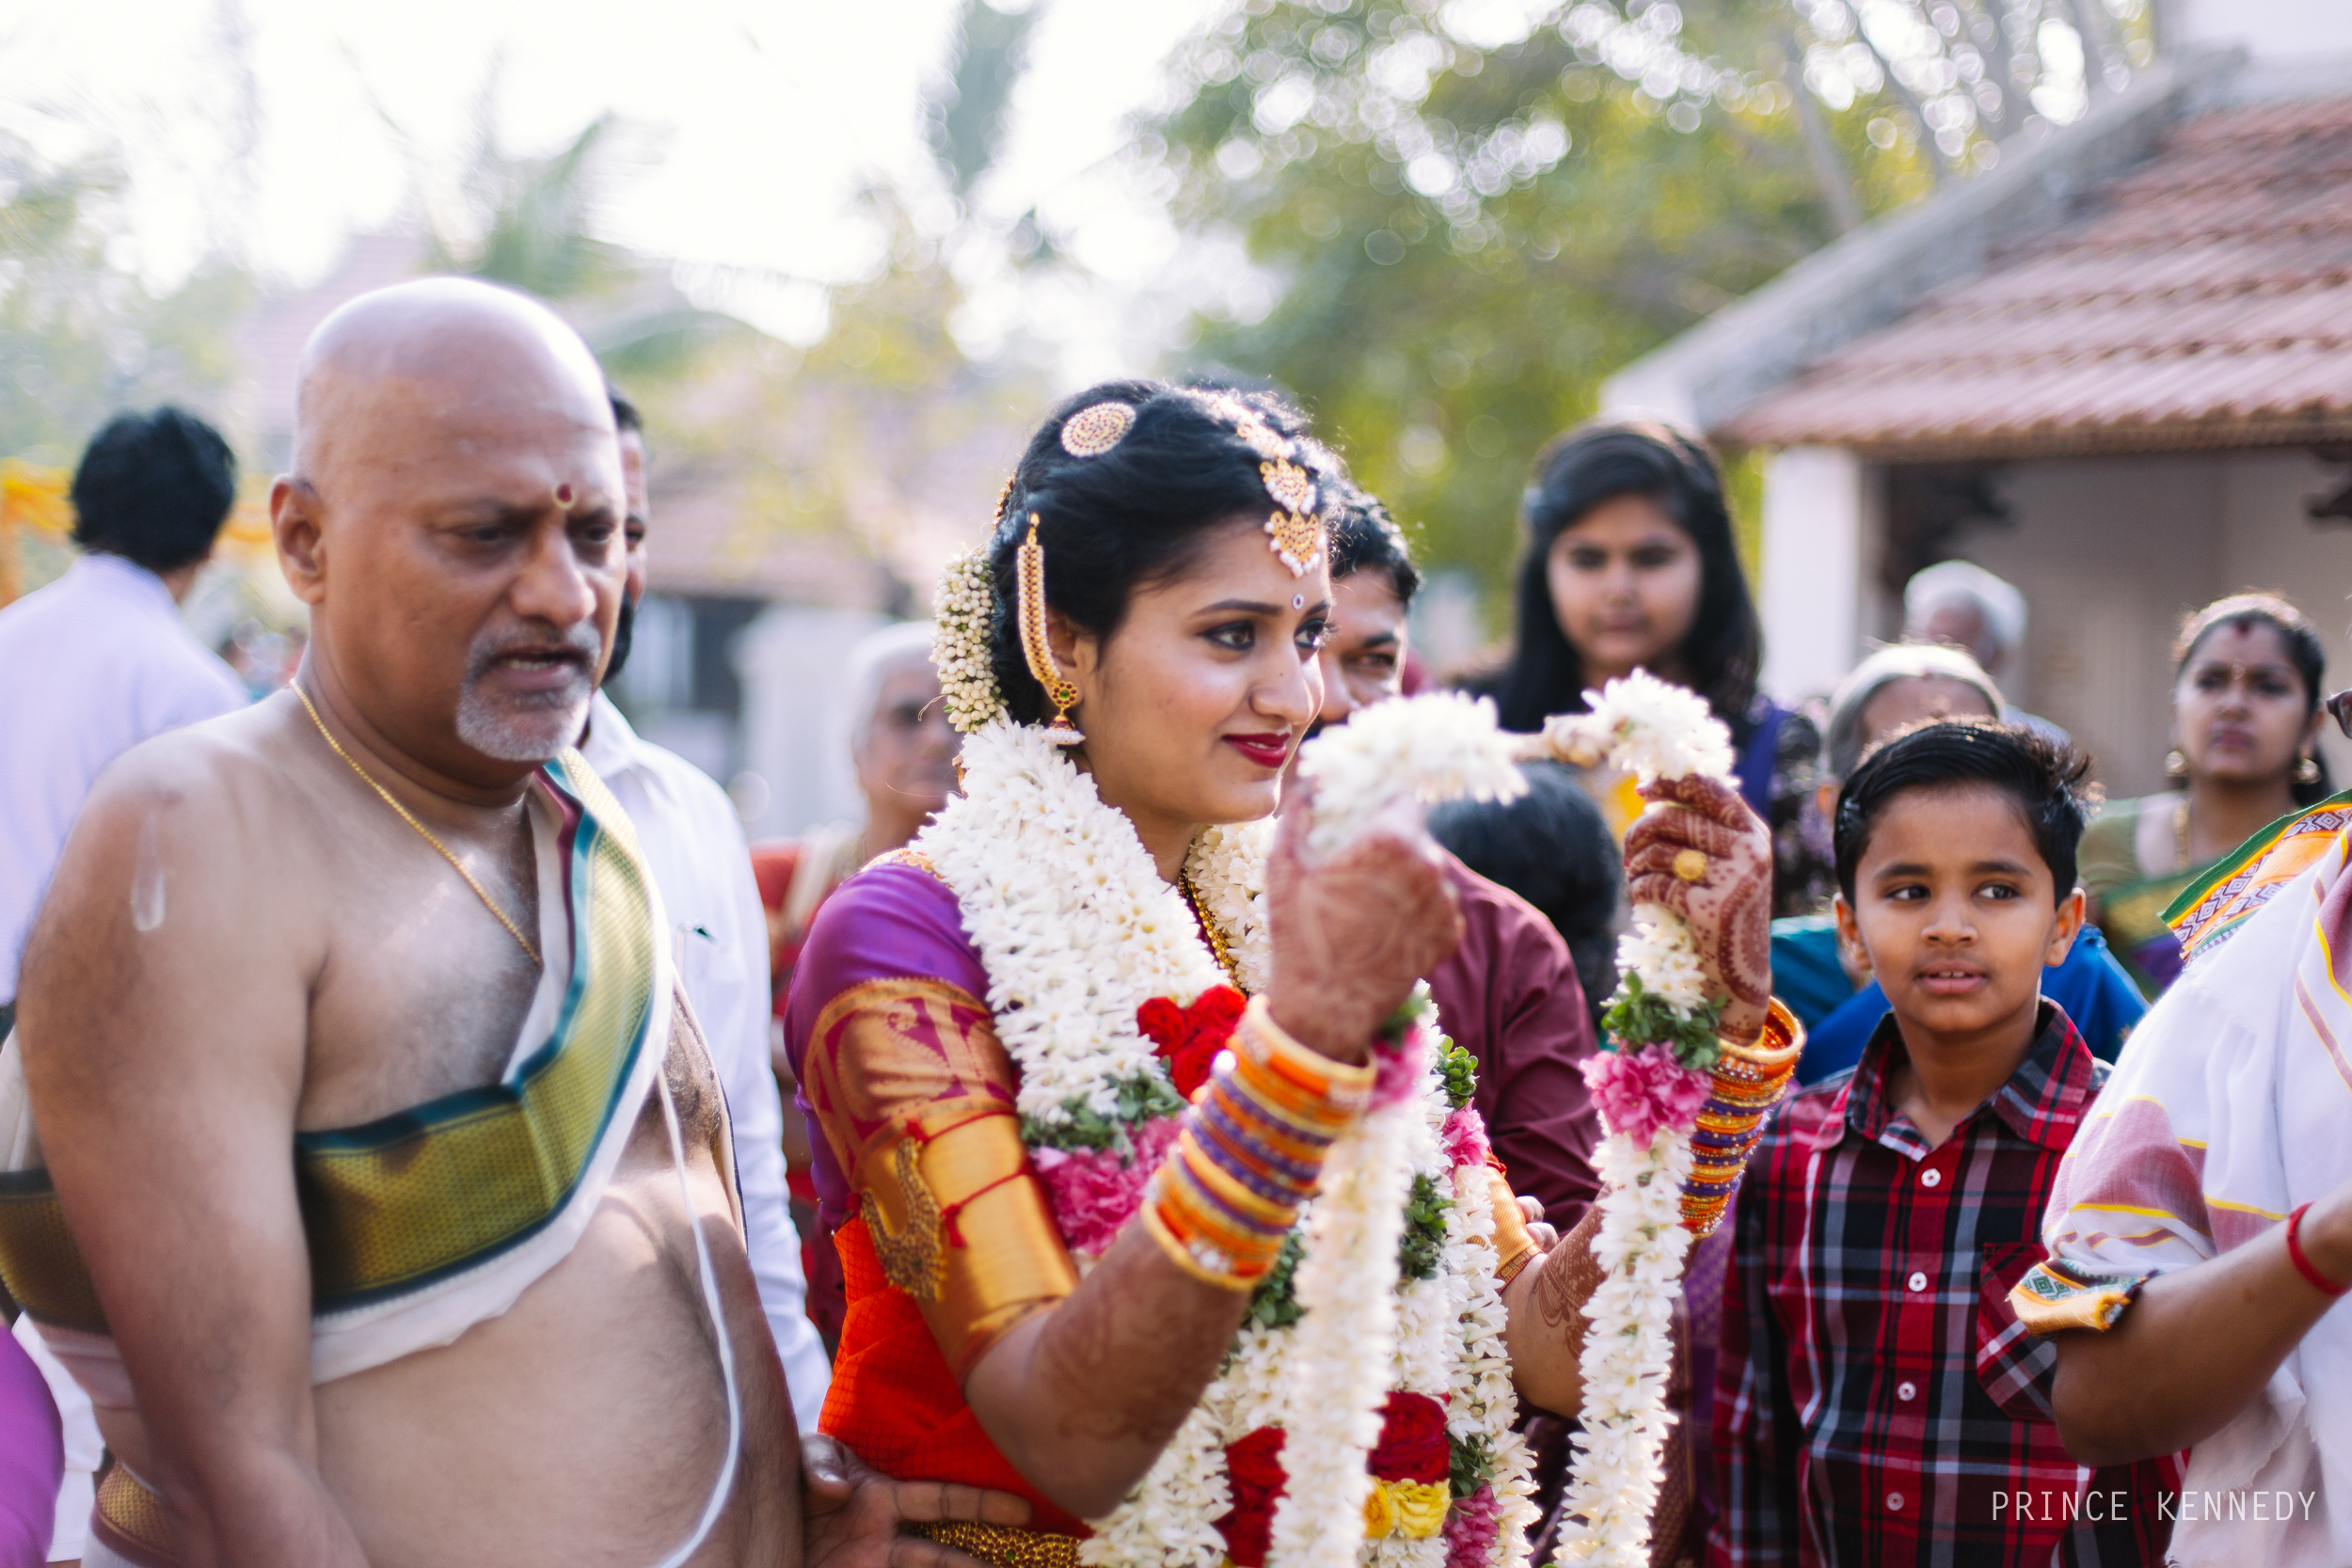 Athmajja-Nithesh-Engagement-Couple-Portrait-Portraiture-Wedding-Couple-Portrait-Chennai-Photographer-Candid-Photography-Destination-Best-Prince-Kennedy-Photography-75.jpg